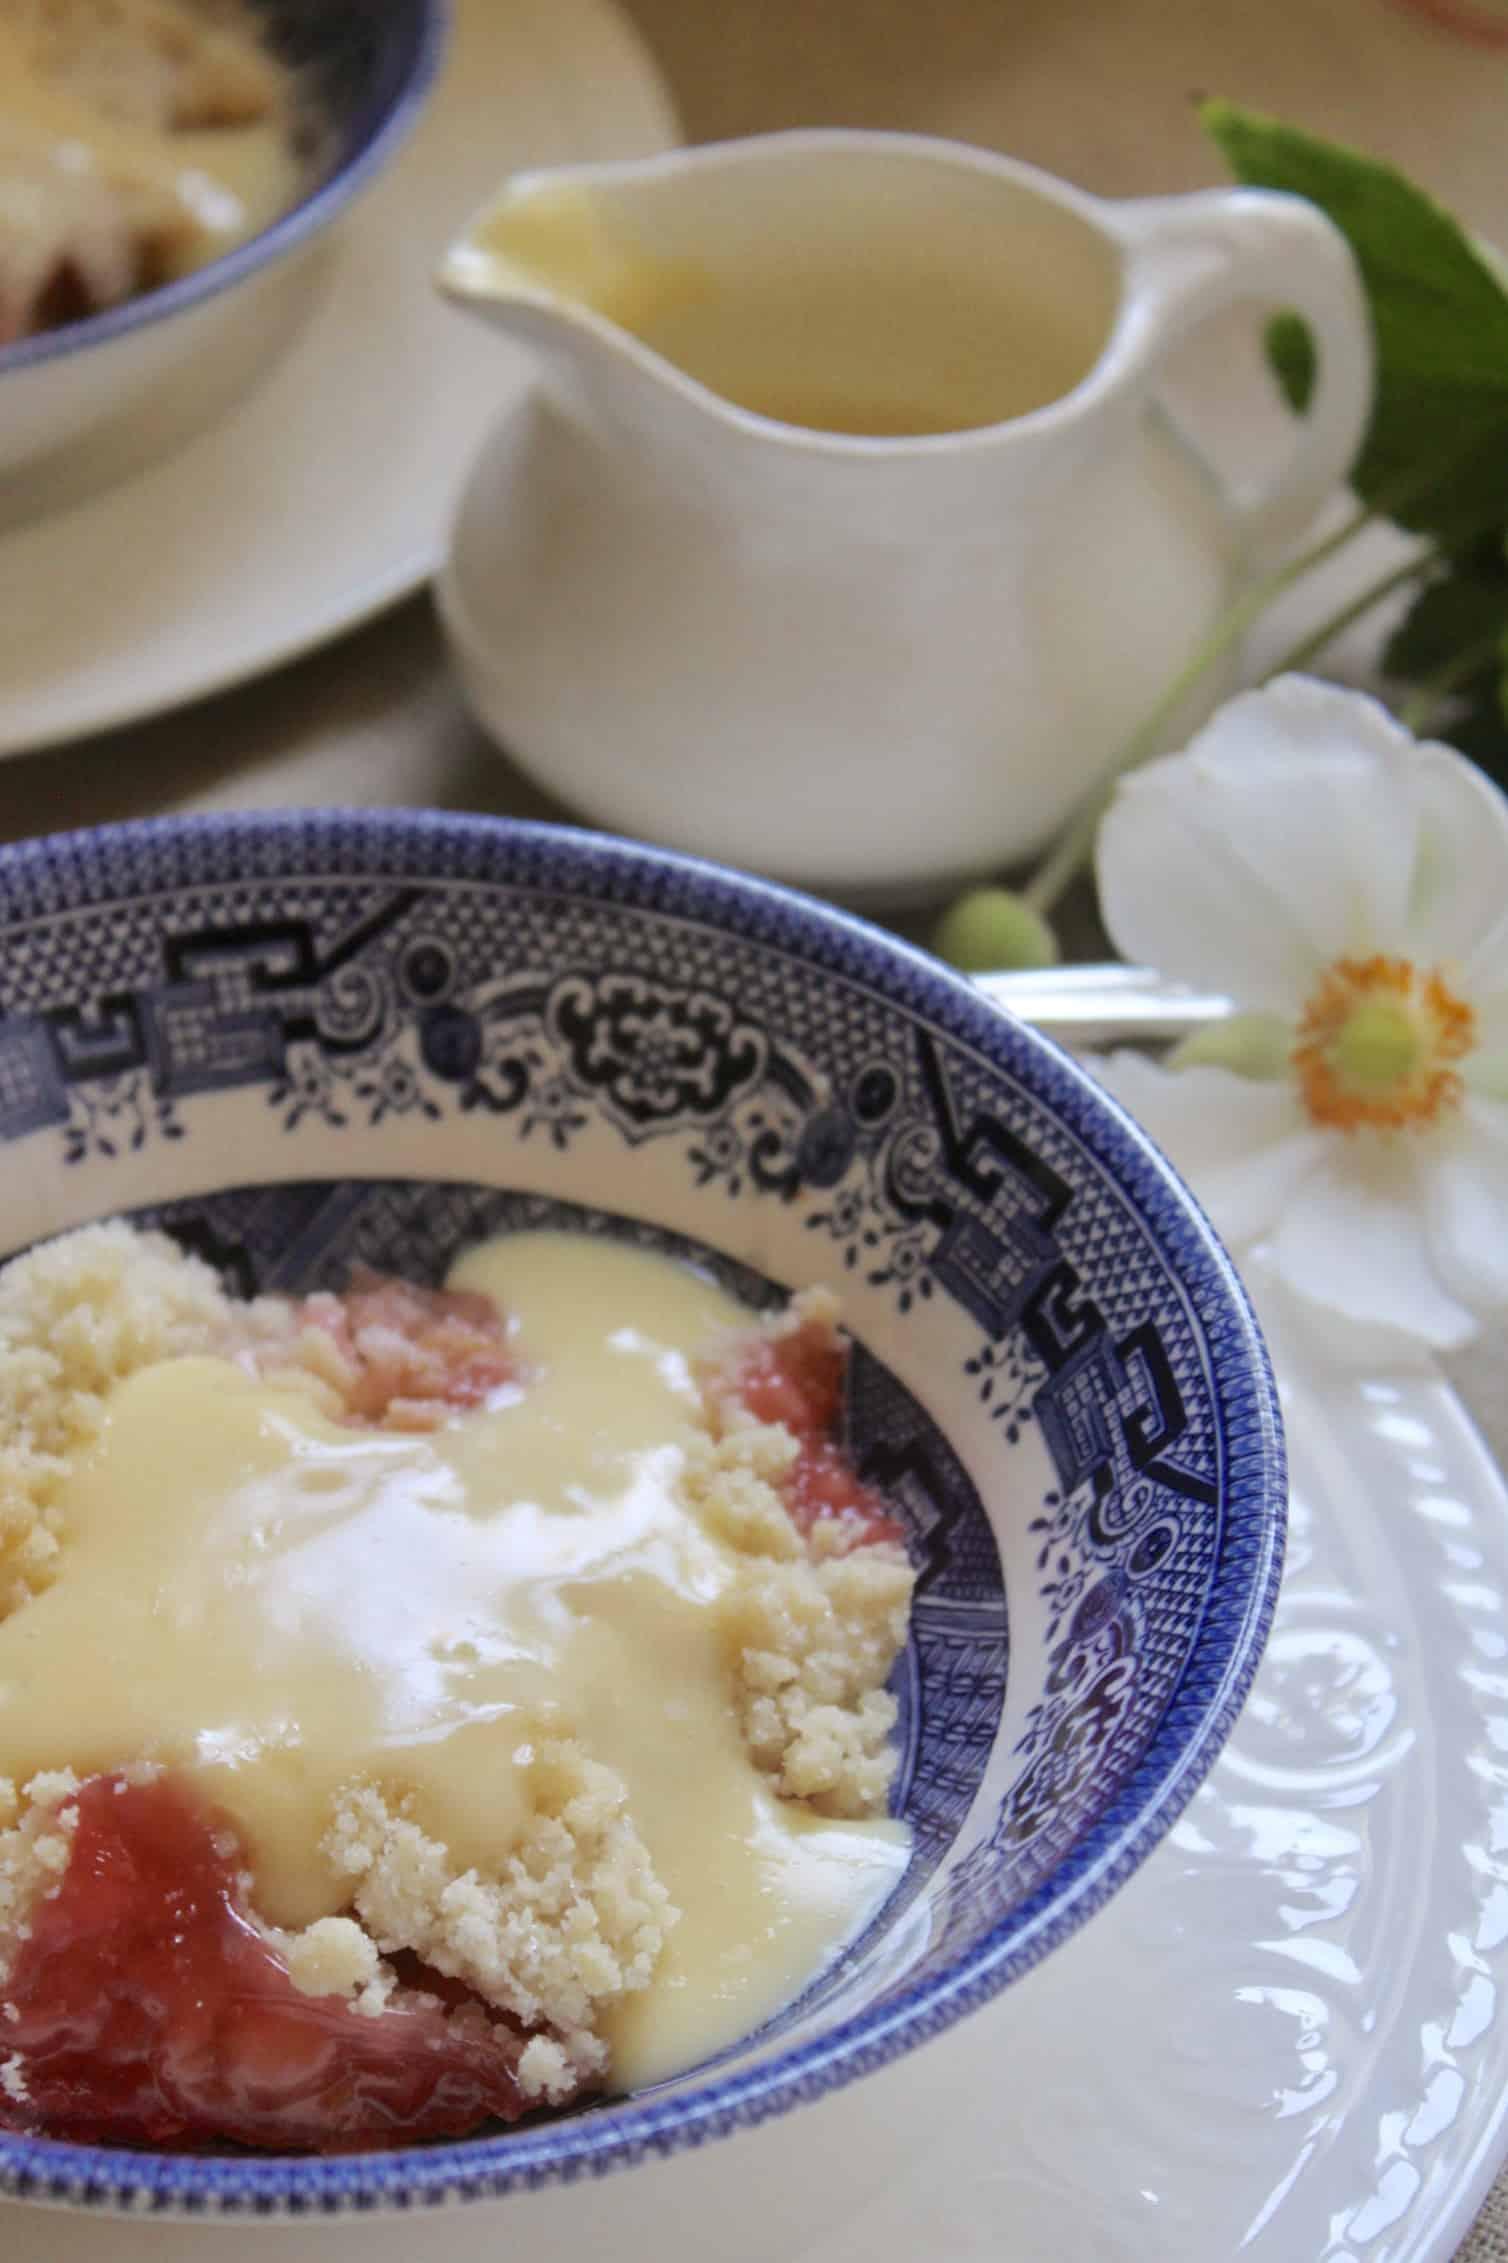 rhubarb crumble with custard and a wee jug